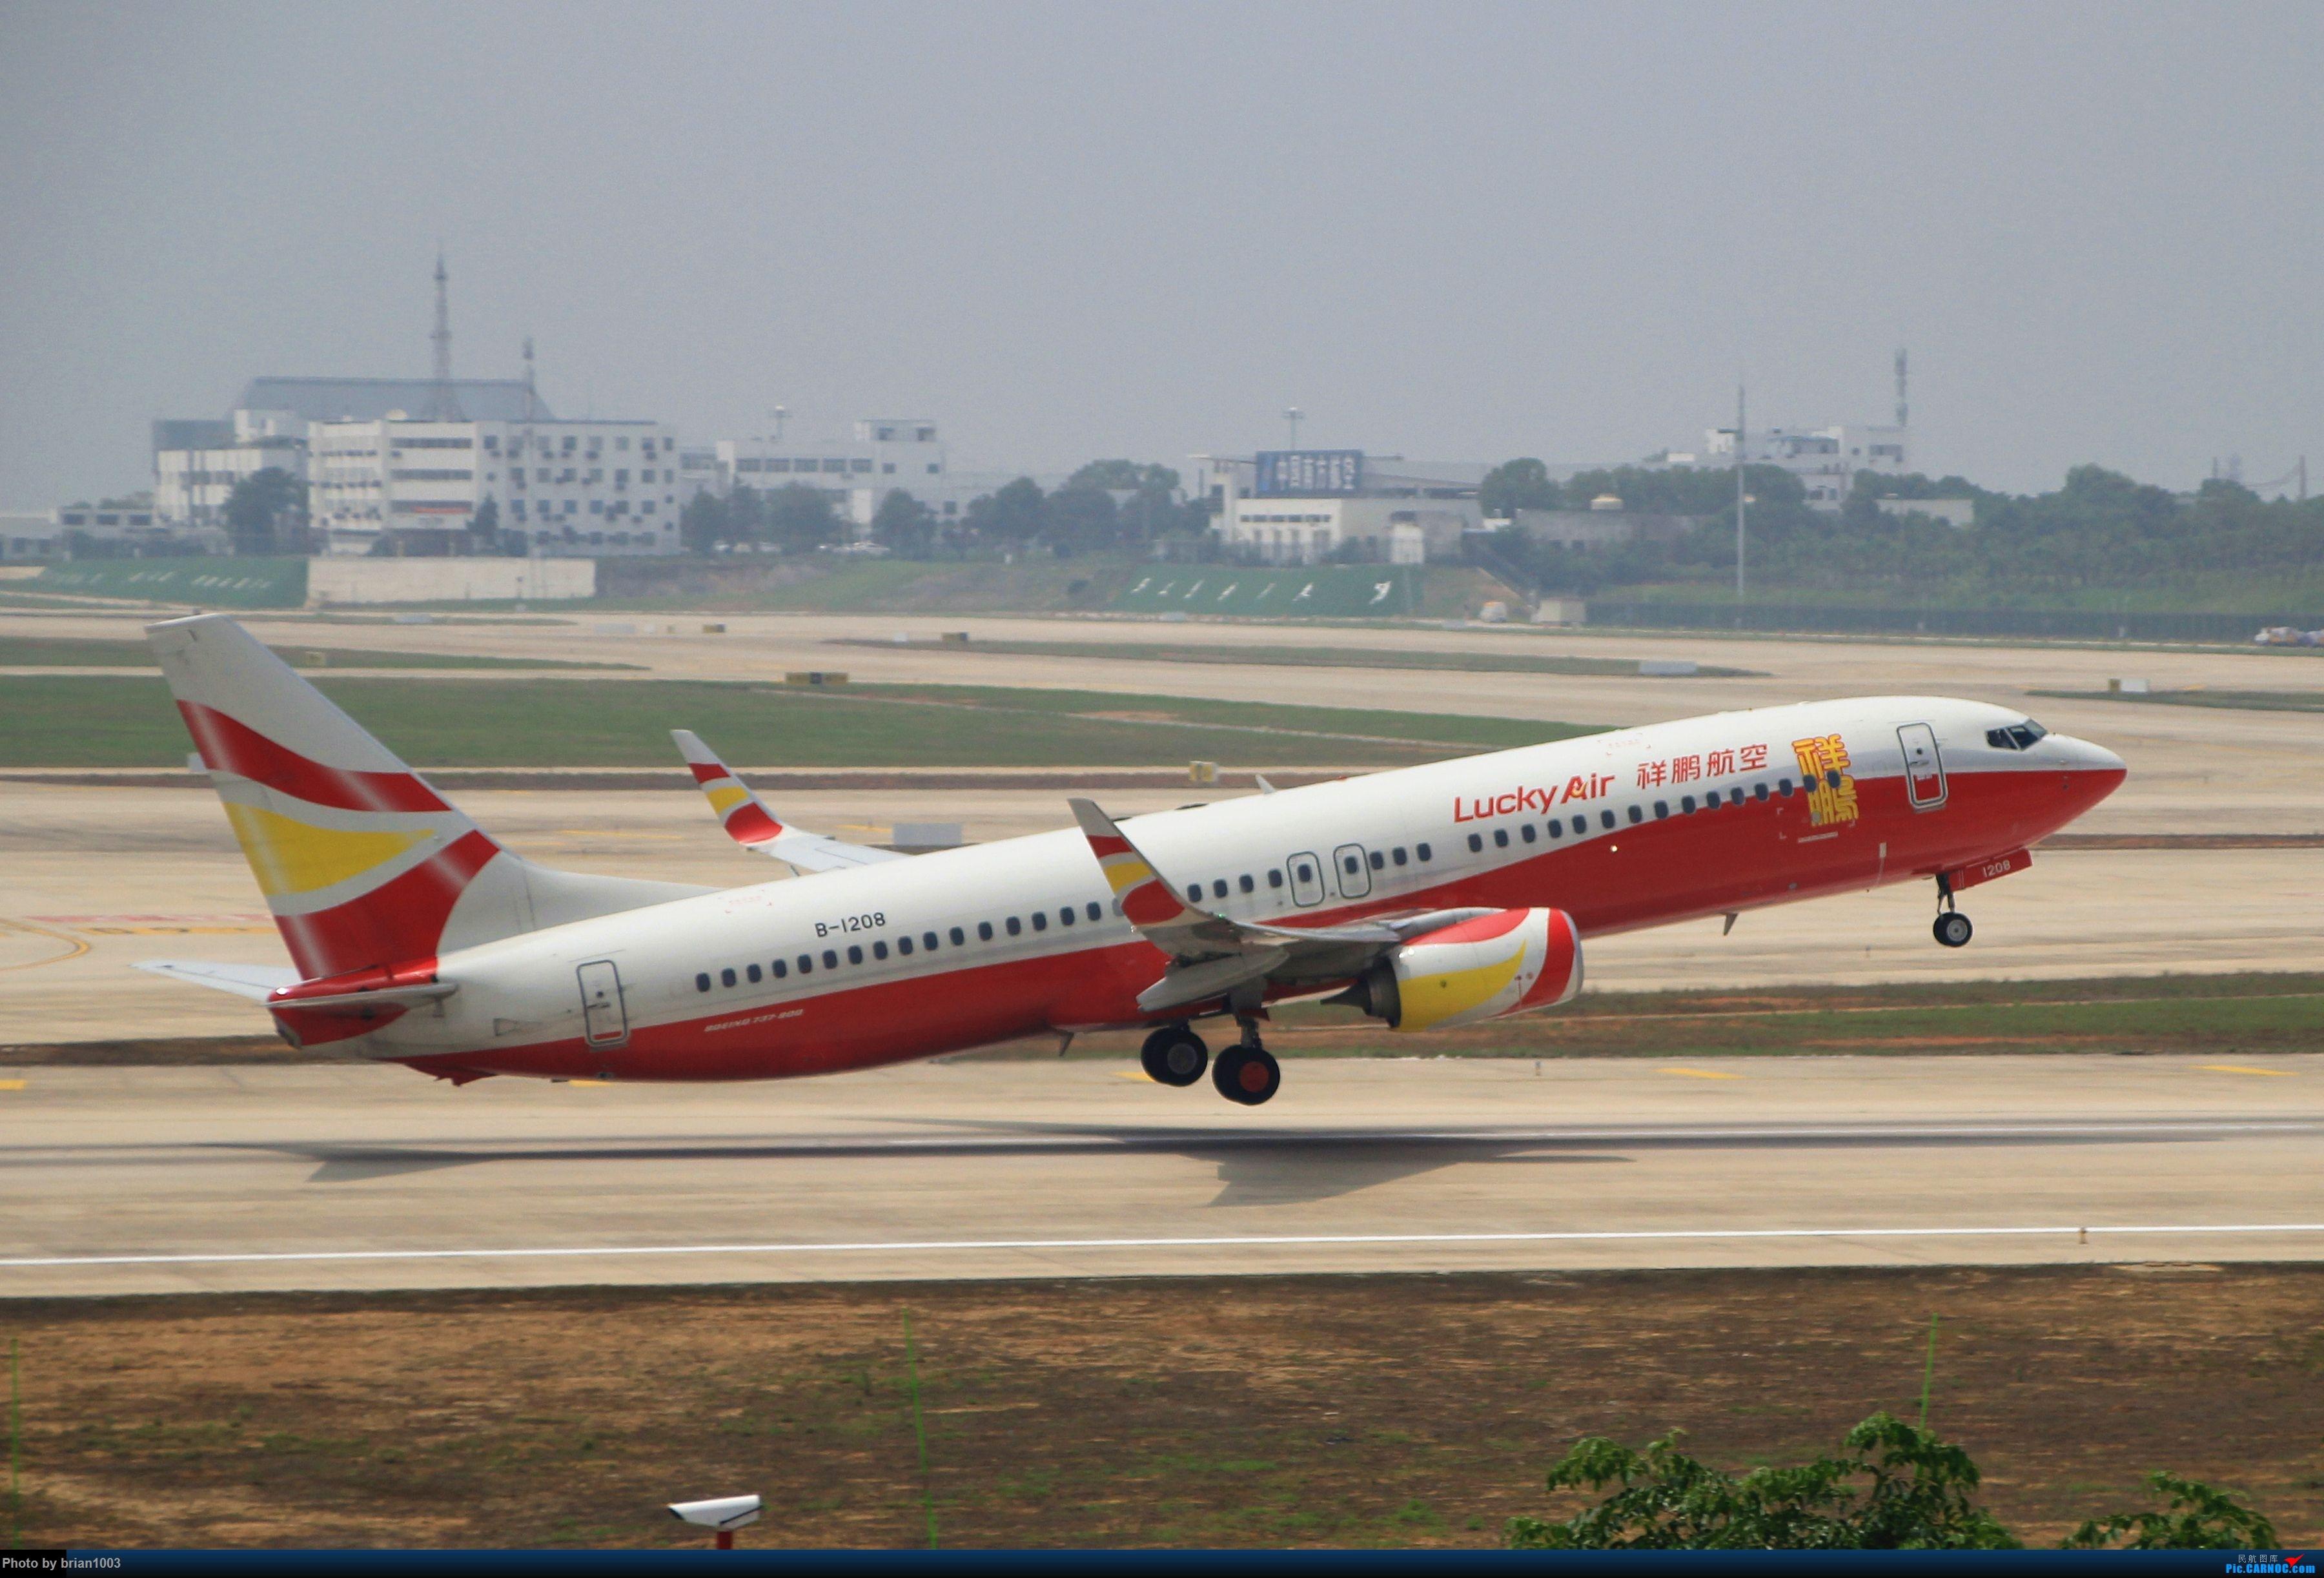 Re:[原创]WUH武汉天河机场拍机之二跑最后忙碌时 BOEING 737-800 B-1208 中国武汉天河国际机场